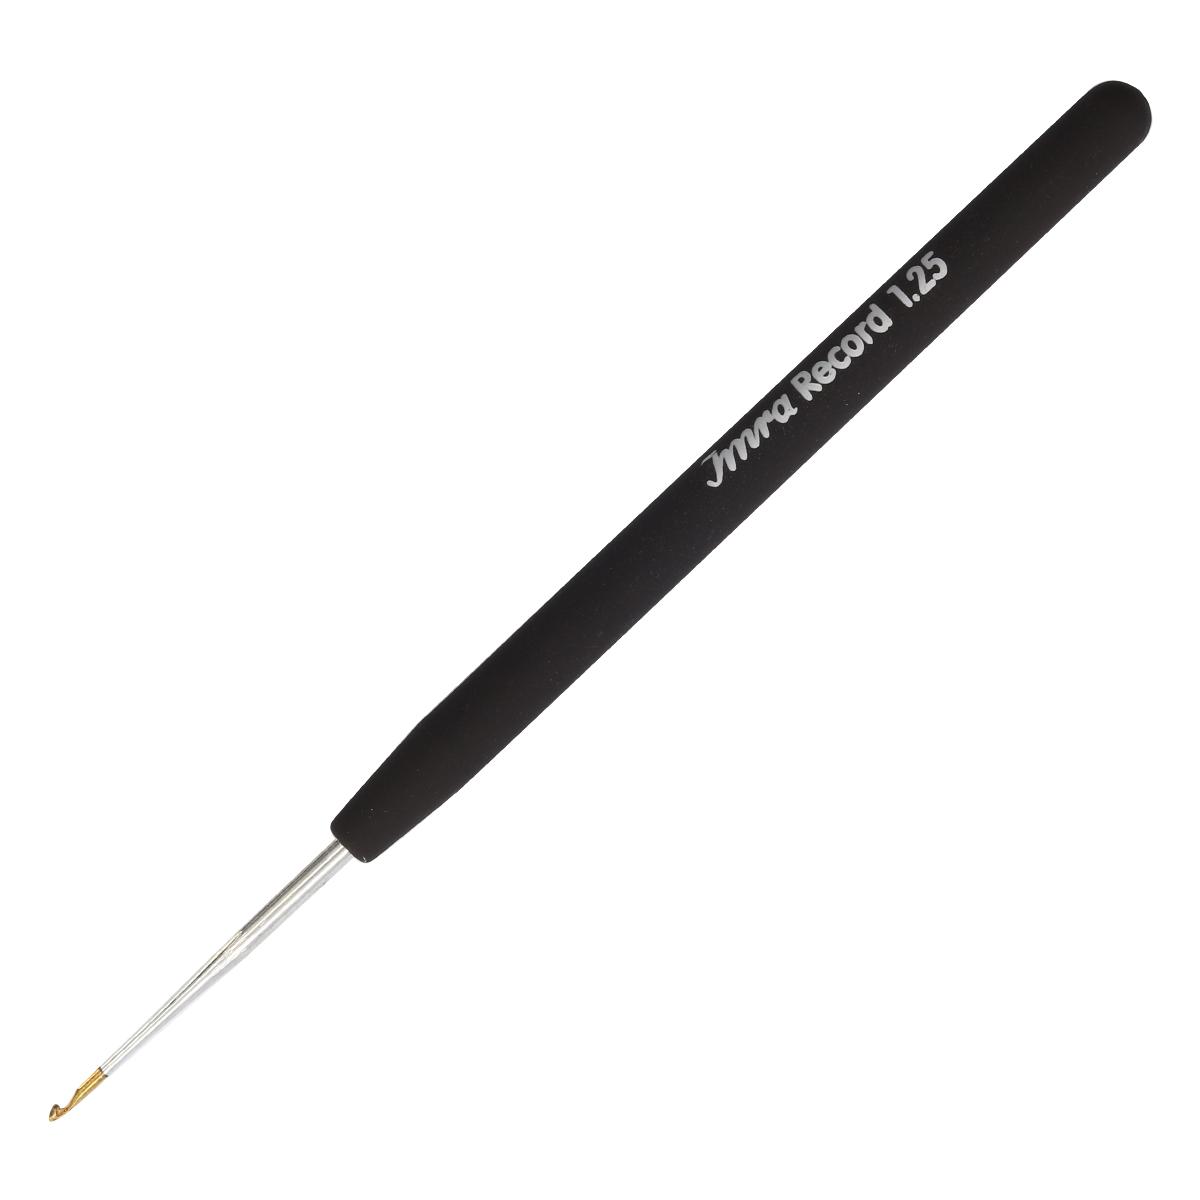 175622 Крючок IMRA Record для тонкой пряжи, мягкая ручка, сталь, 1,25 мм, Prym